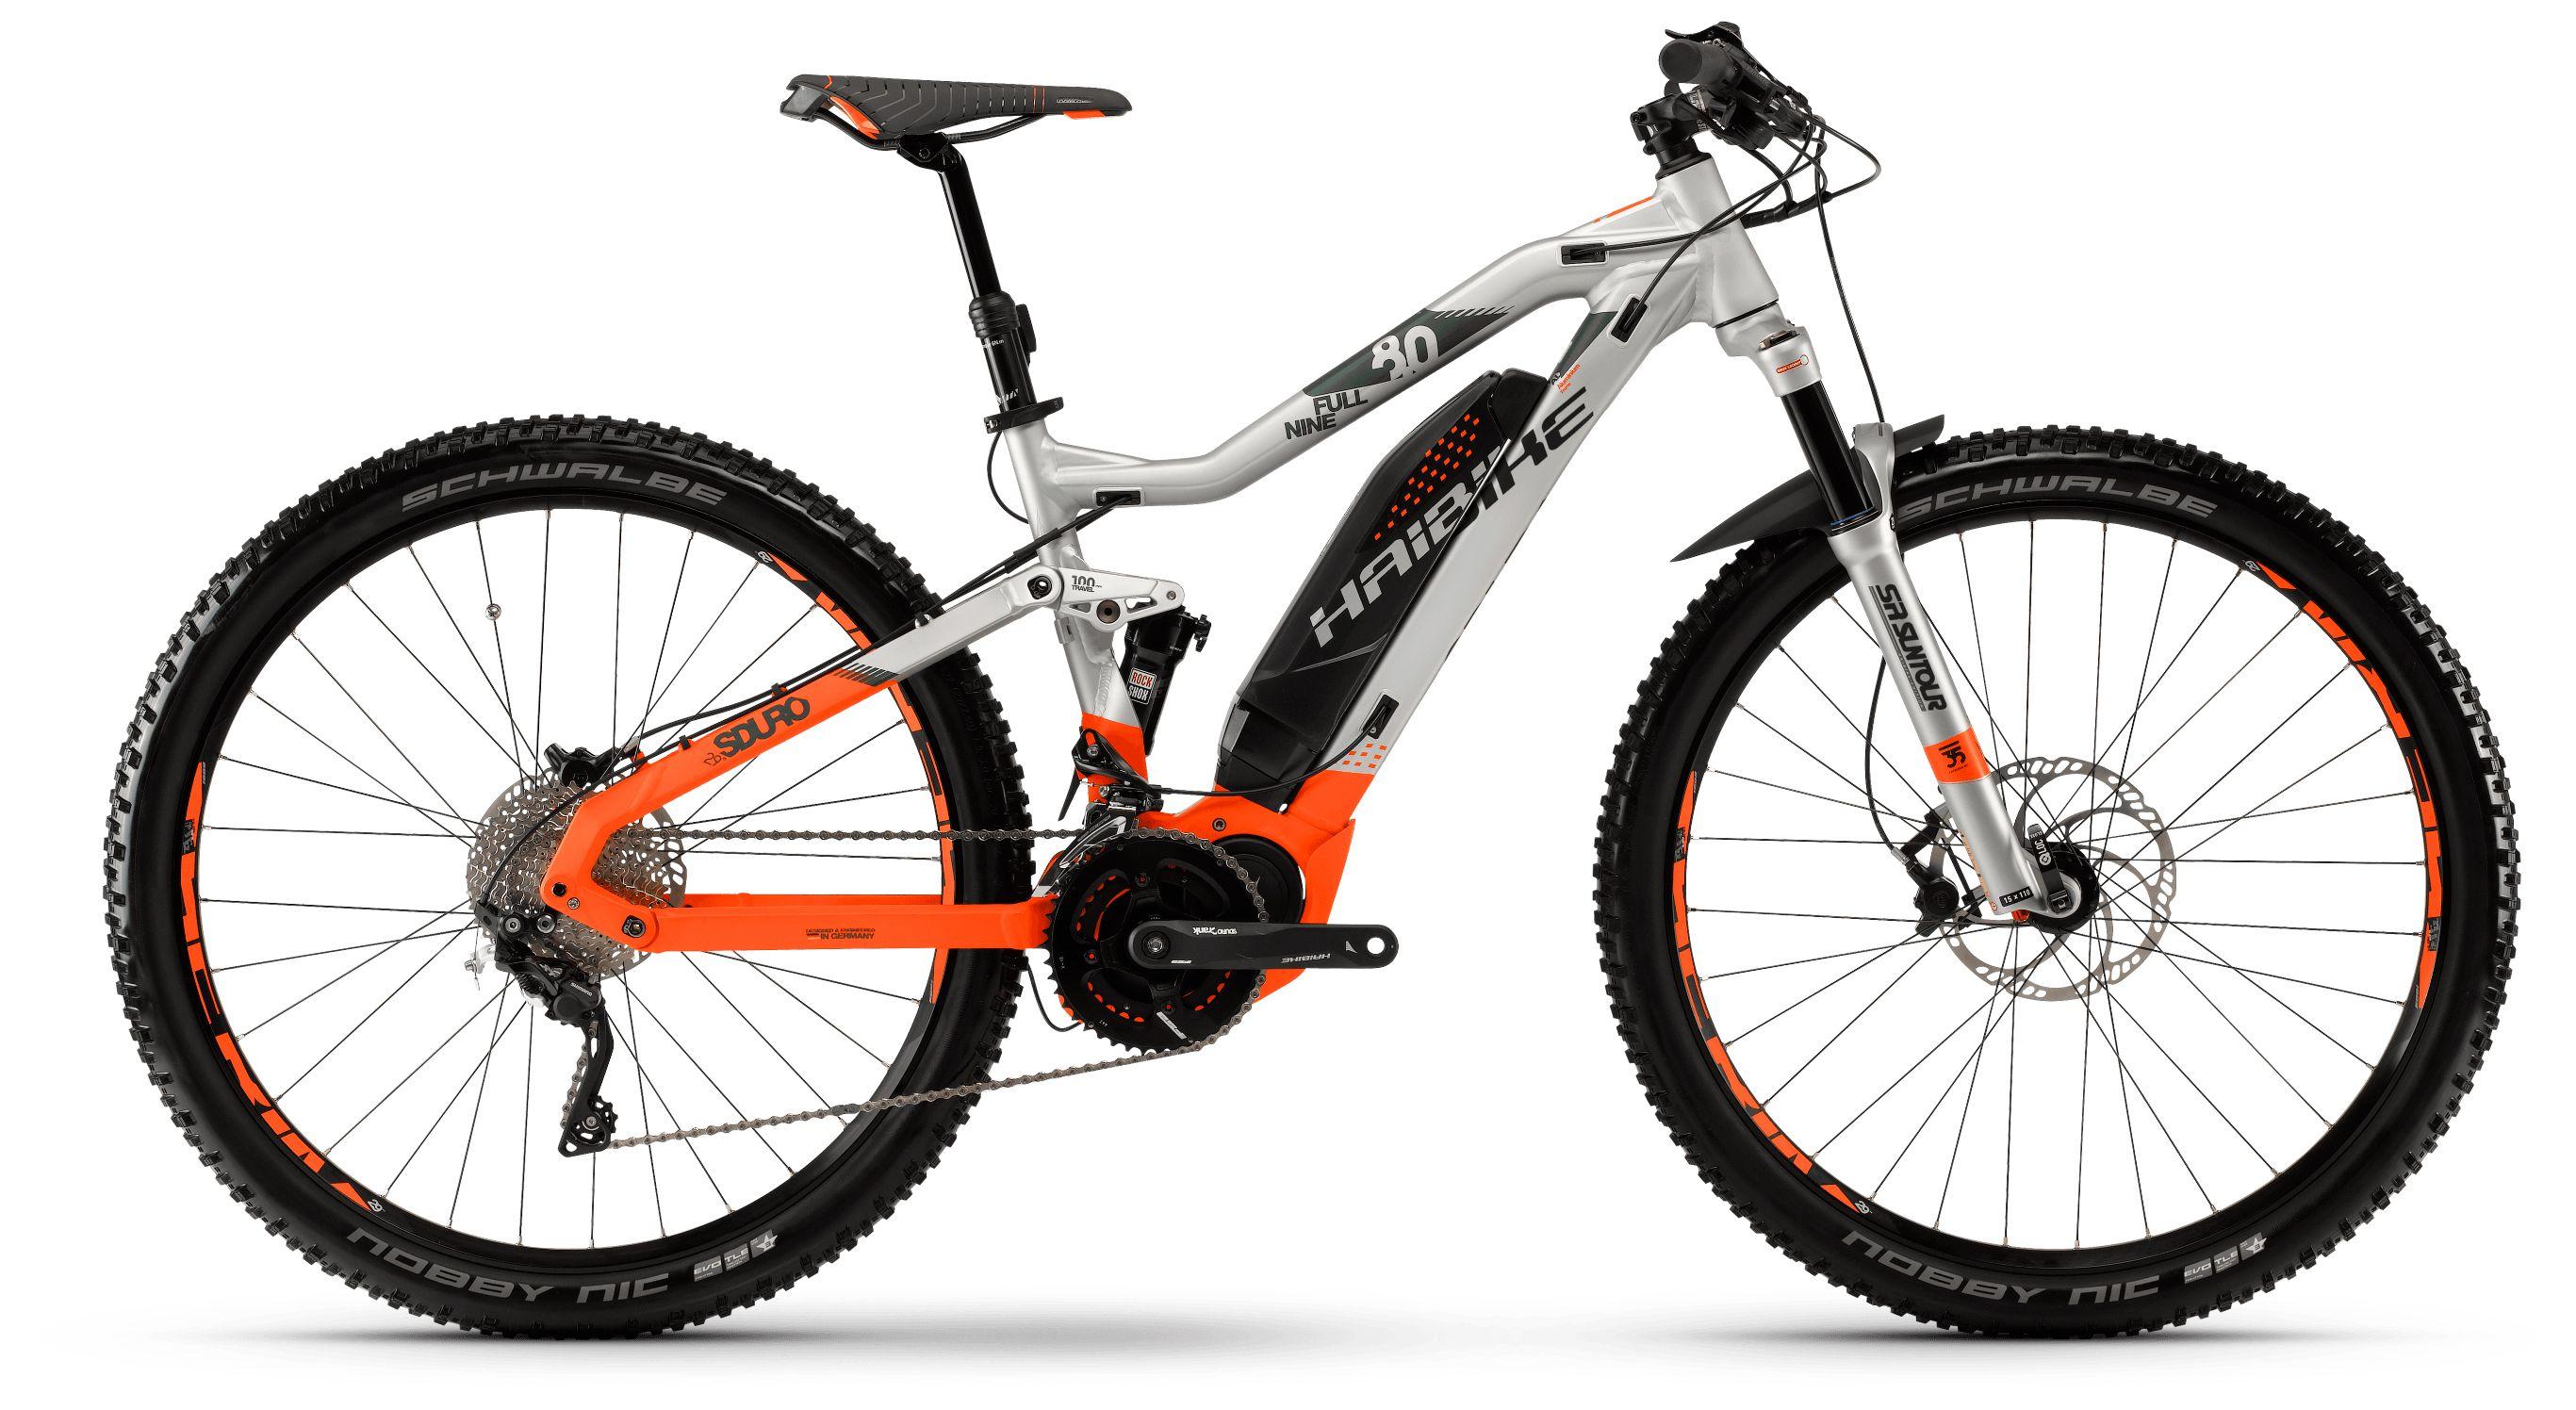 Велосипед Haibike Sduro FullNine 8.0 500Wh 20-Sp XT HB YXC 2018 купить электромотор миникота эндура 30